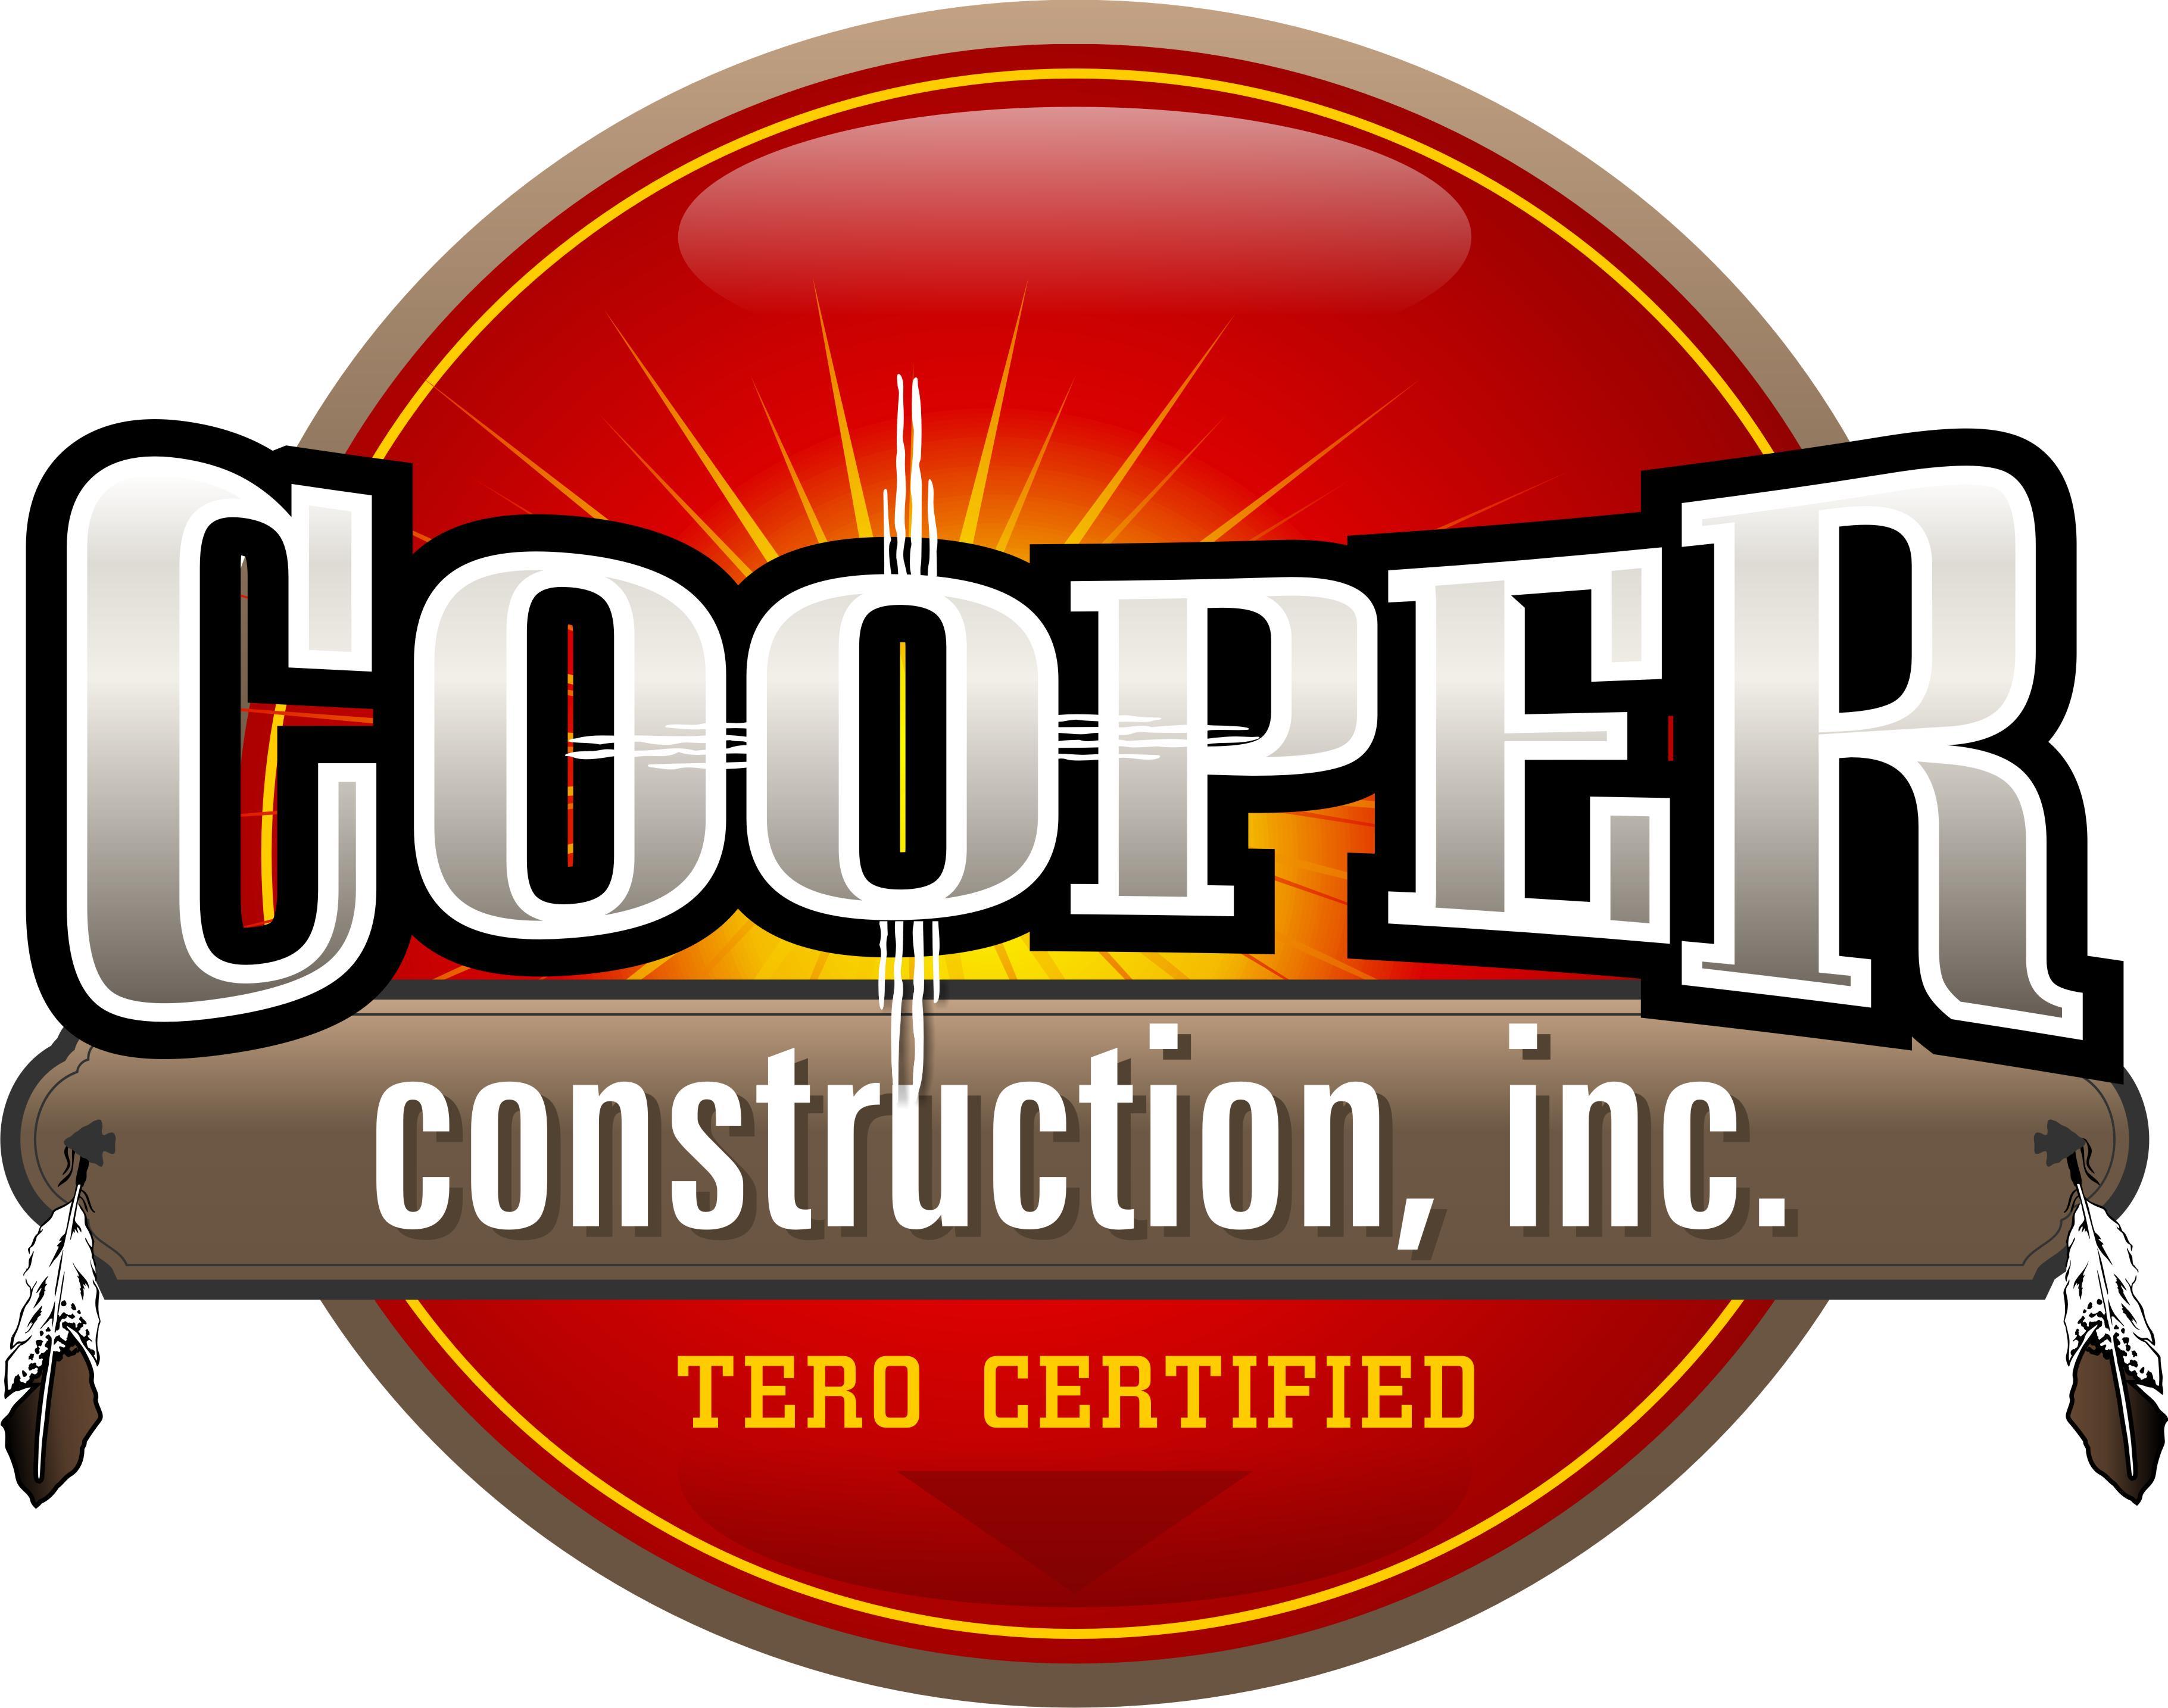 Cooper Construction, Inc.